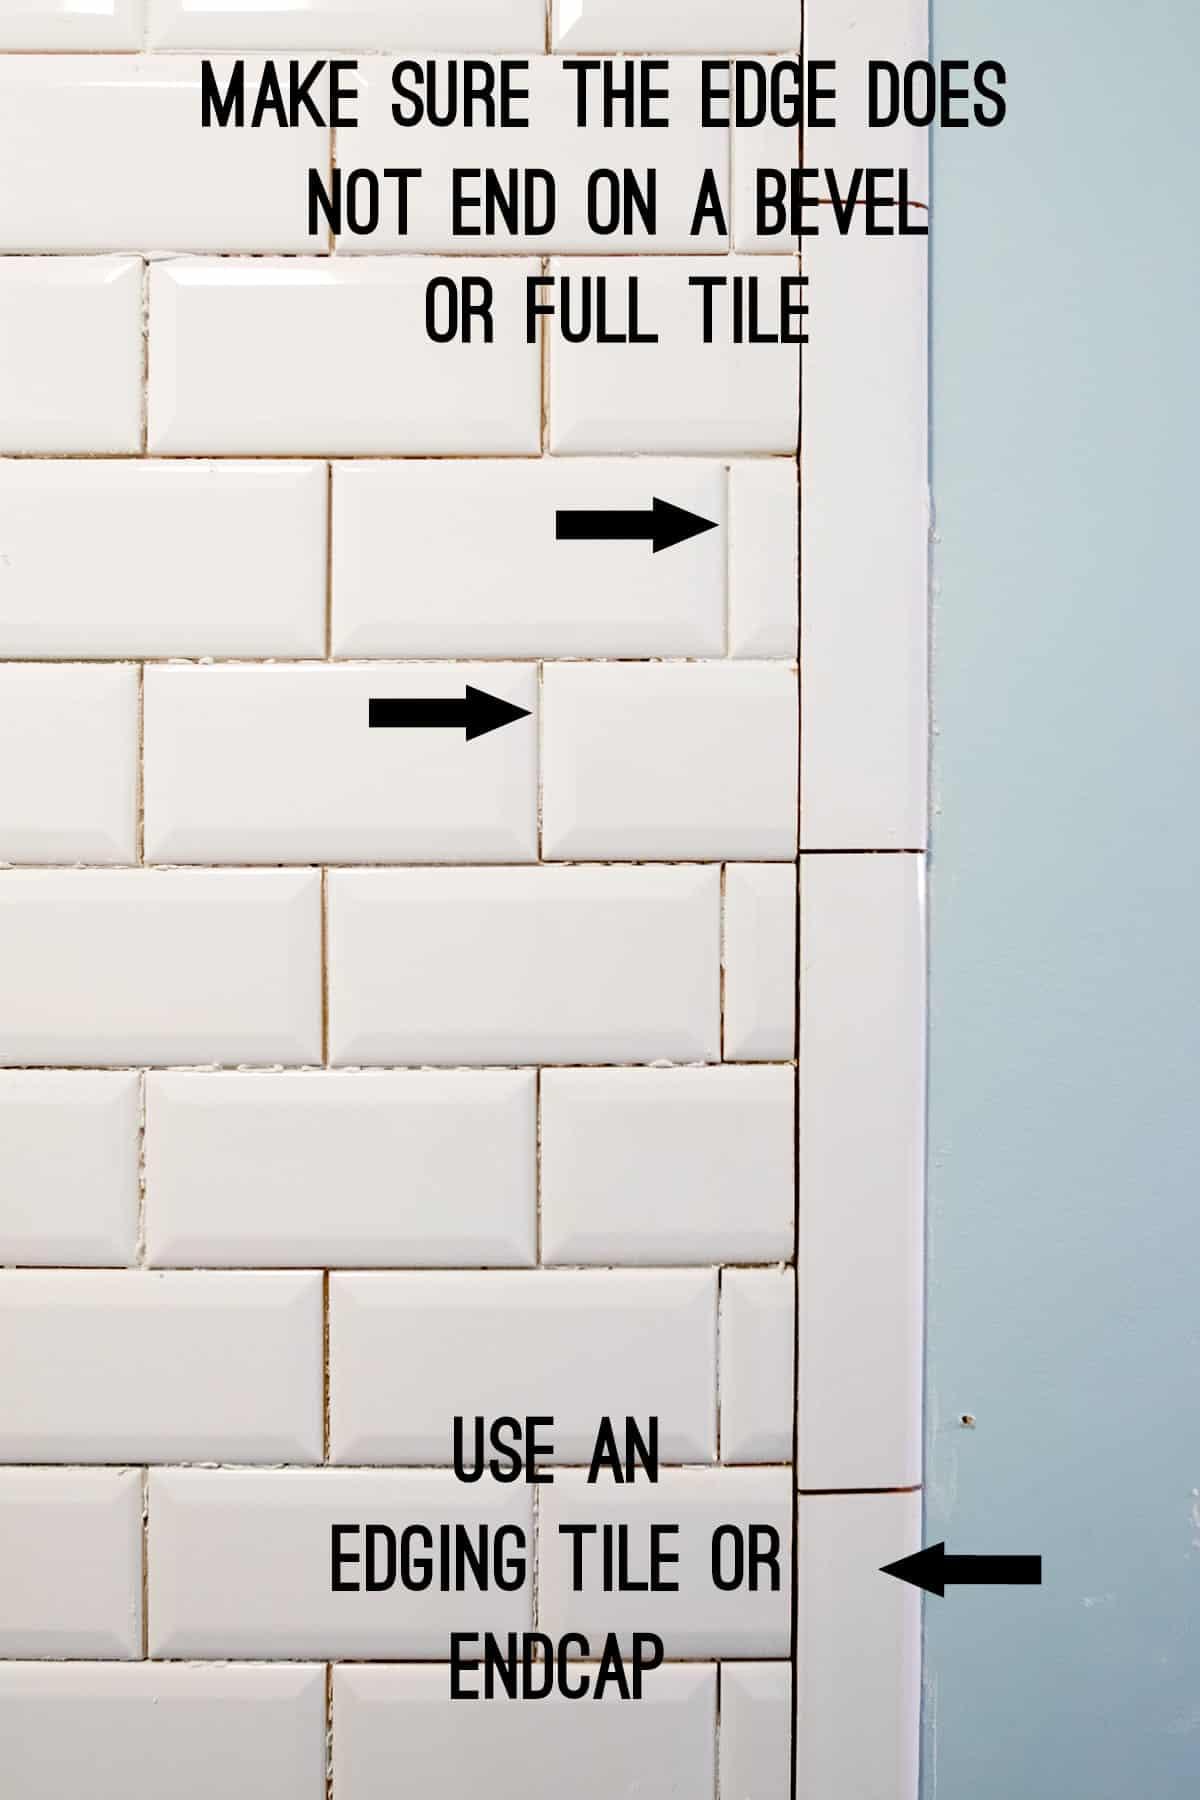 White subway tile layout  with edging tile endcap.